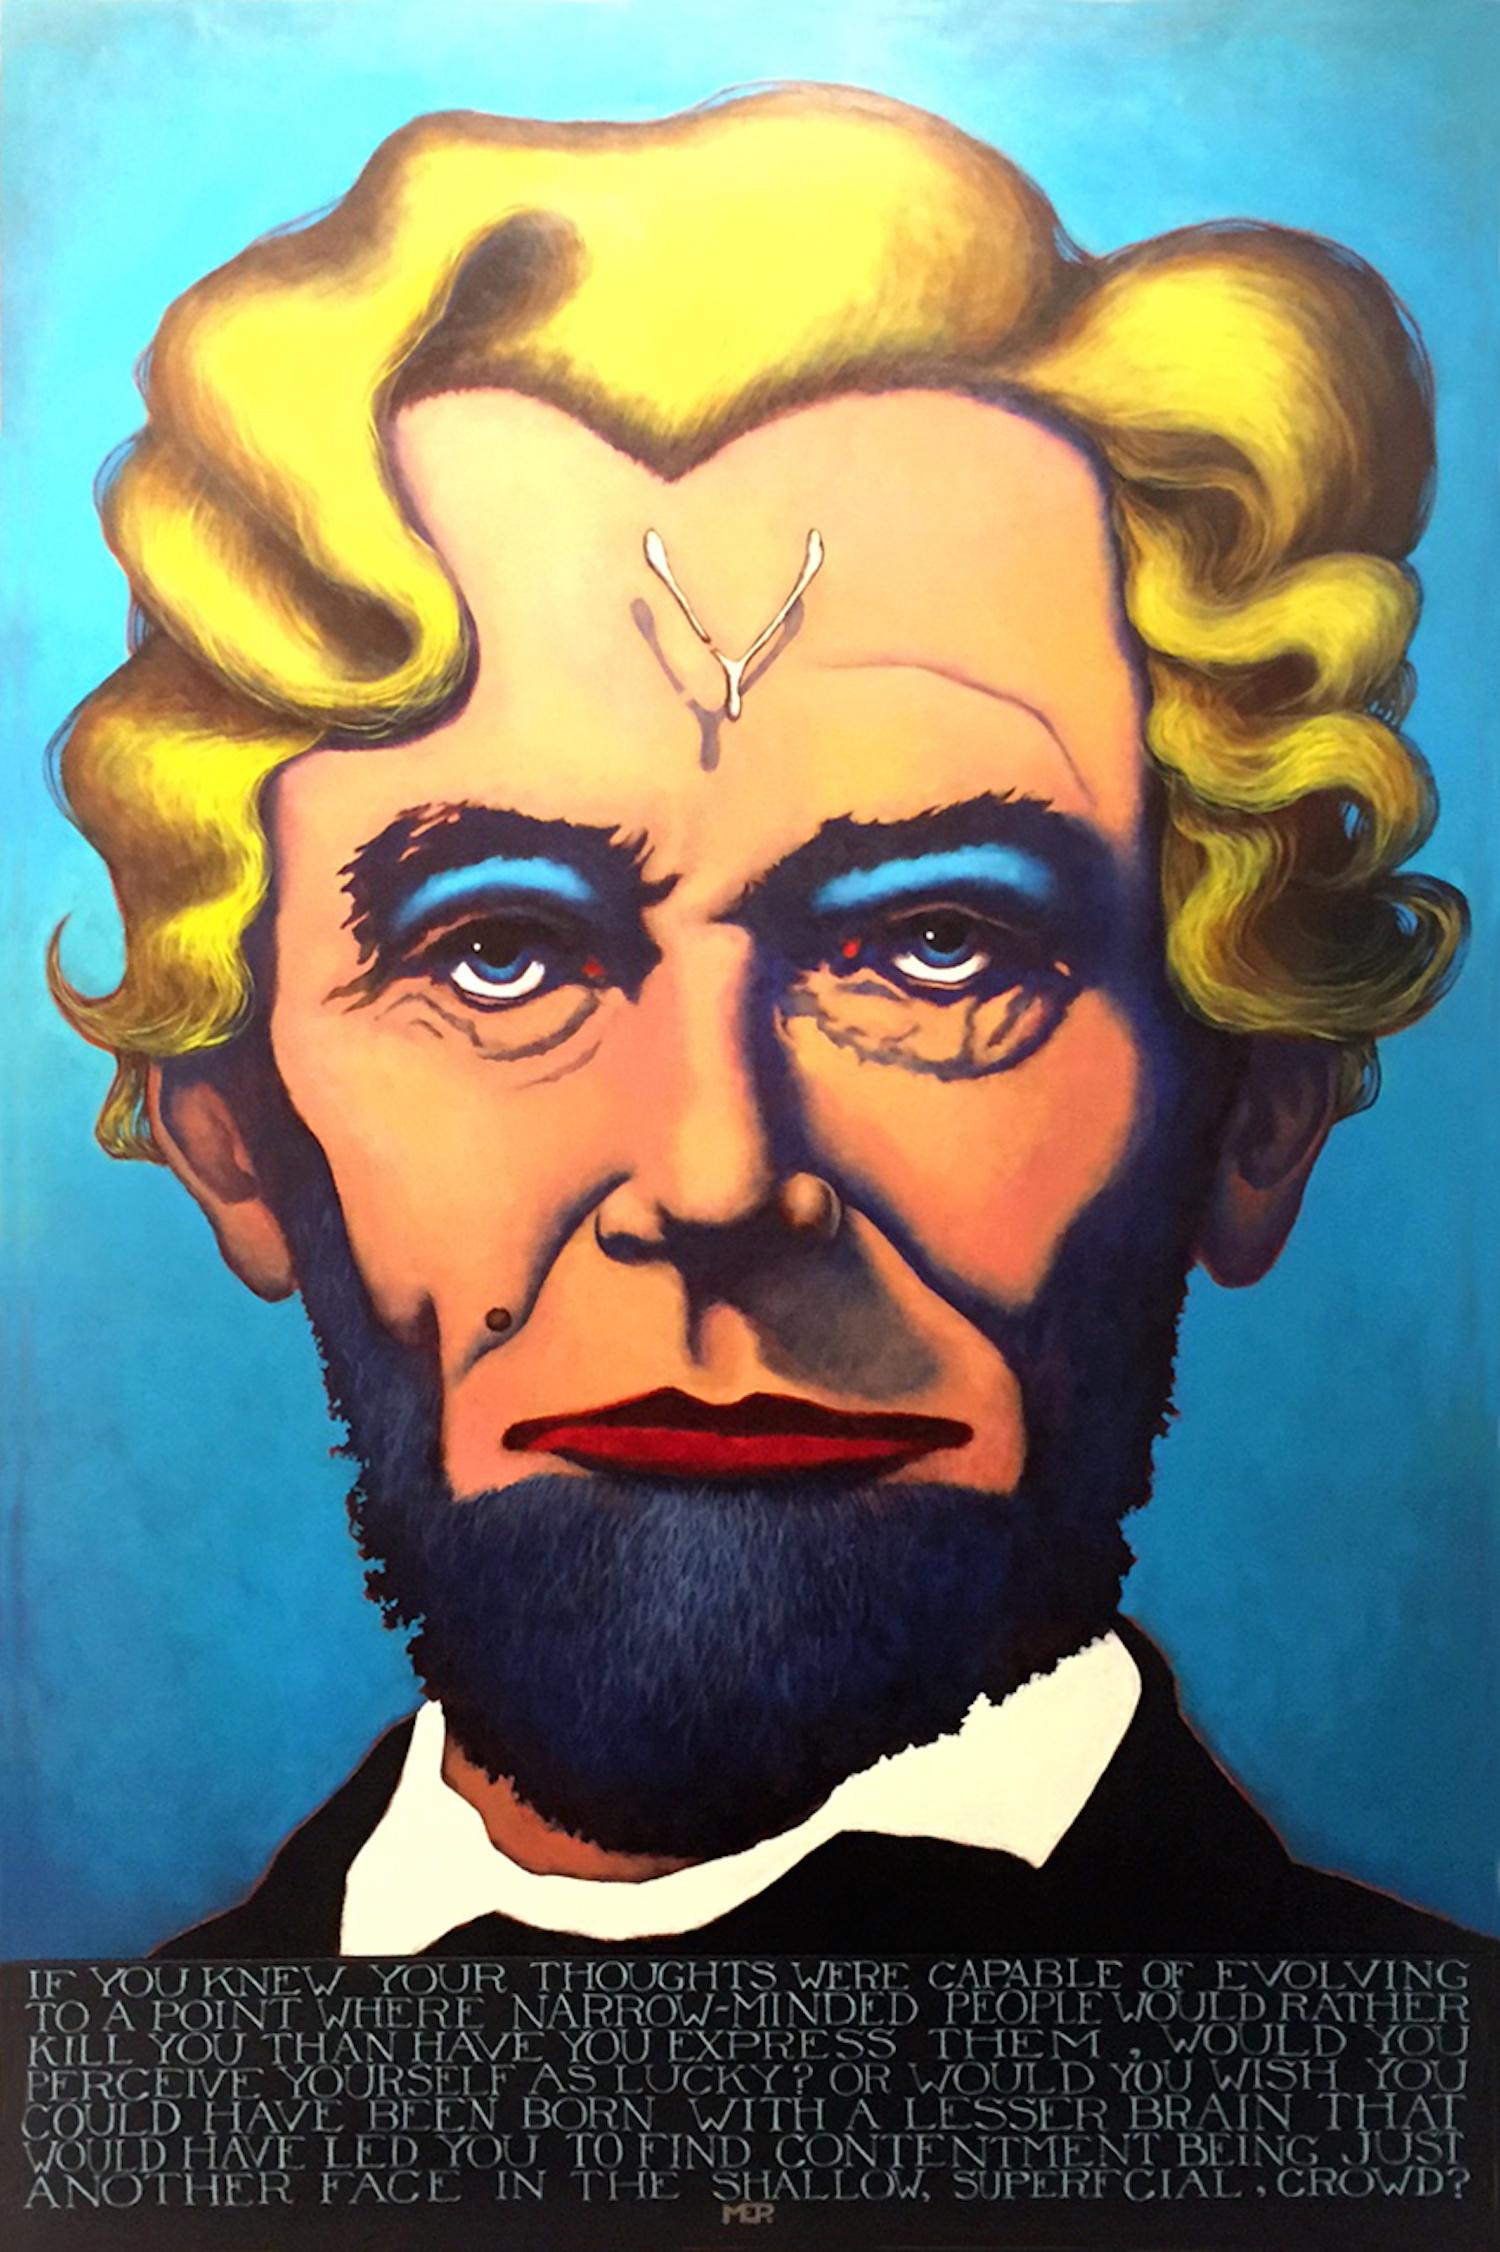 Baberaham Lincoln